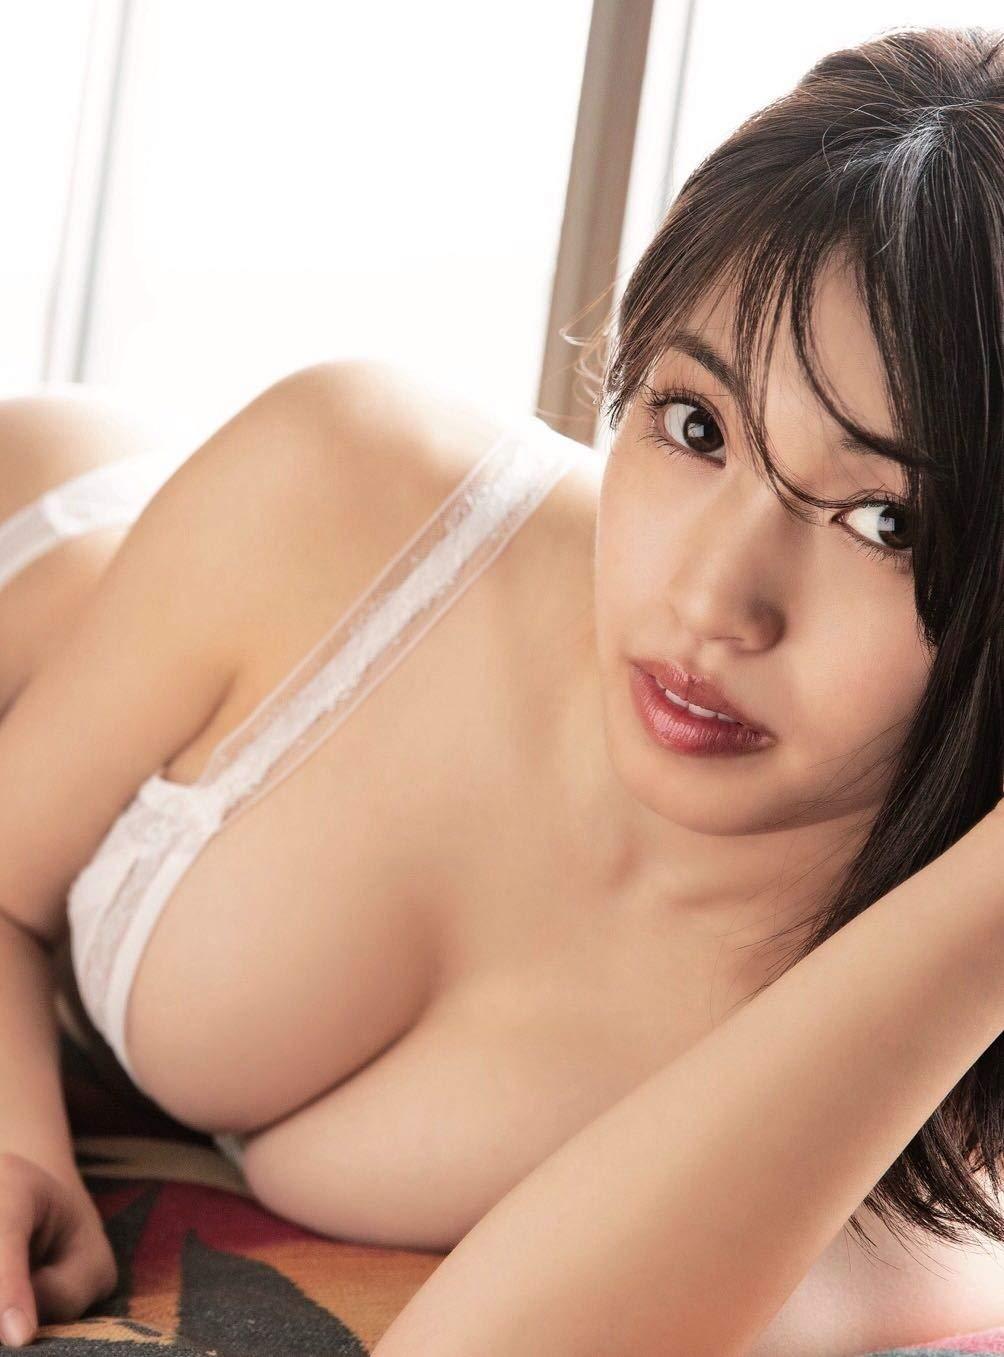 Fカップグラドル MIYU さん 動画と画像の作品リスト